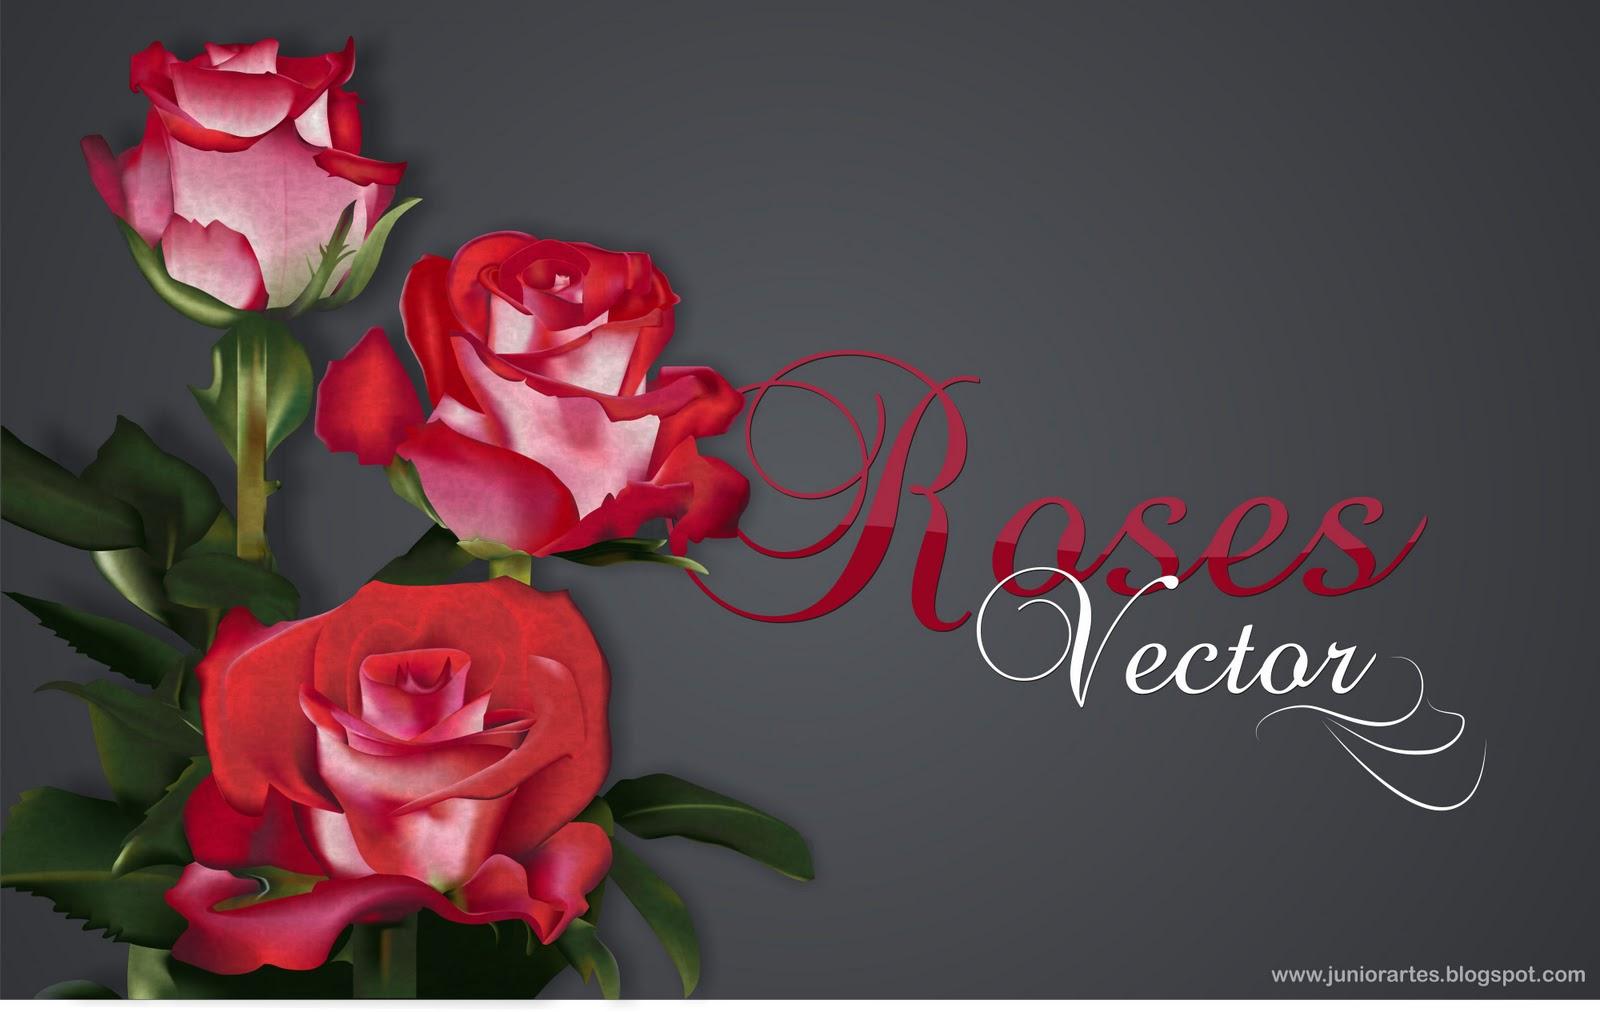 http://2.bp.blogspot.com/-k1RCawUIh5o/Tw94STgSbOI/AAAAAAAAA_M/010u0EV5CL4/s1600/ROSAS+Vector+Wallpaper+01.jpg